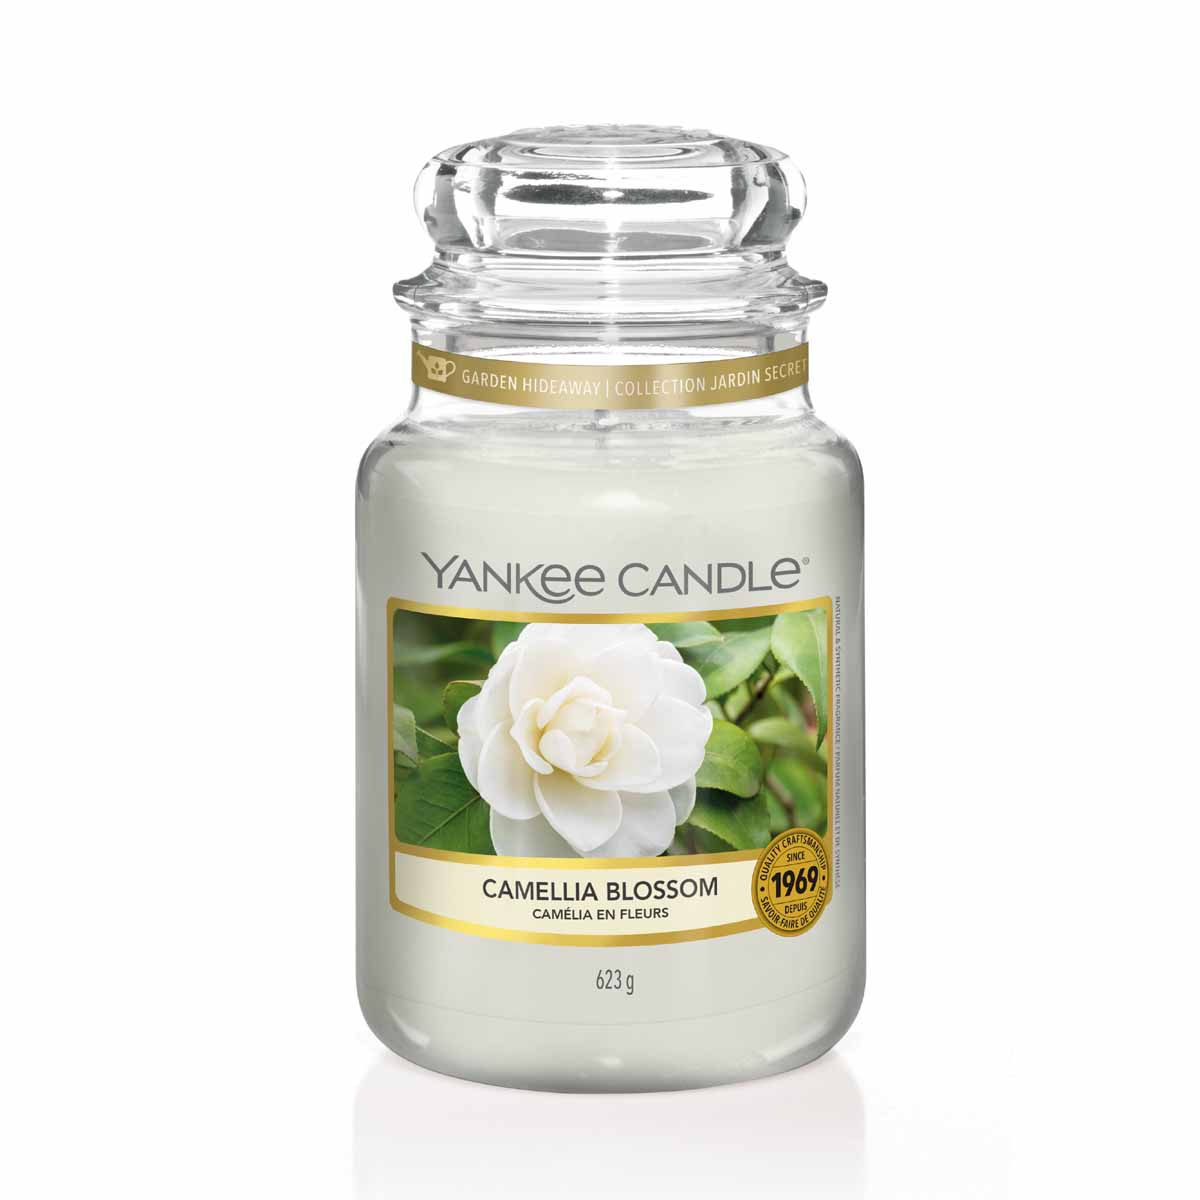 Yankee Candle Camellia Blossom Giara Grande